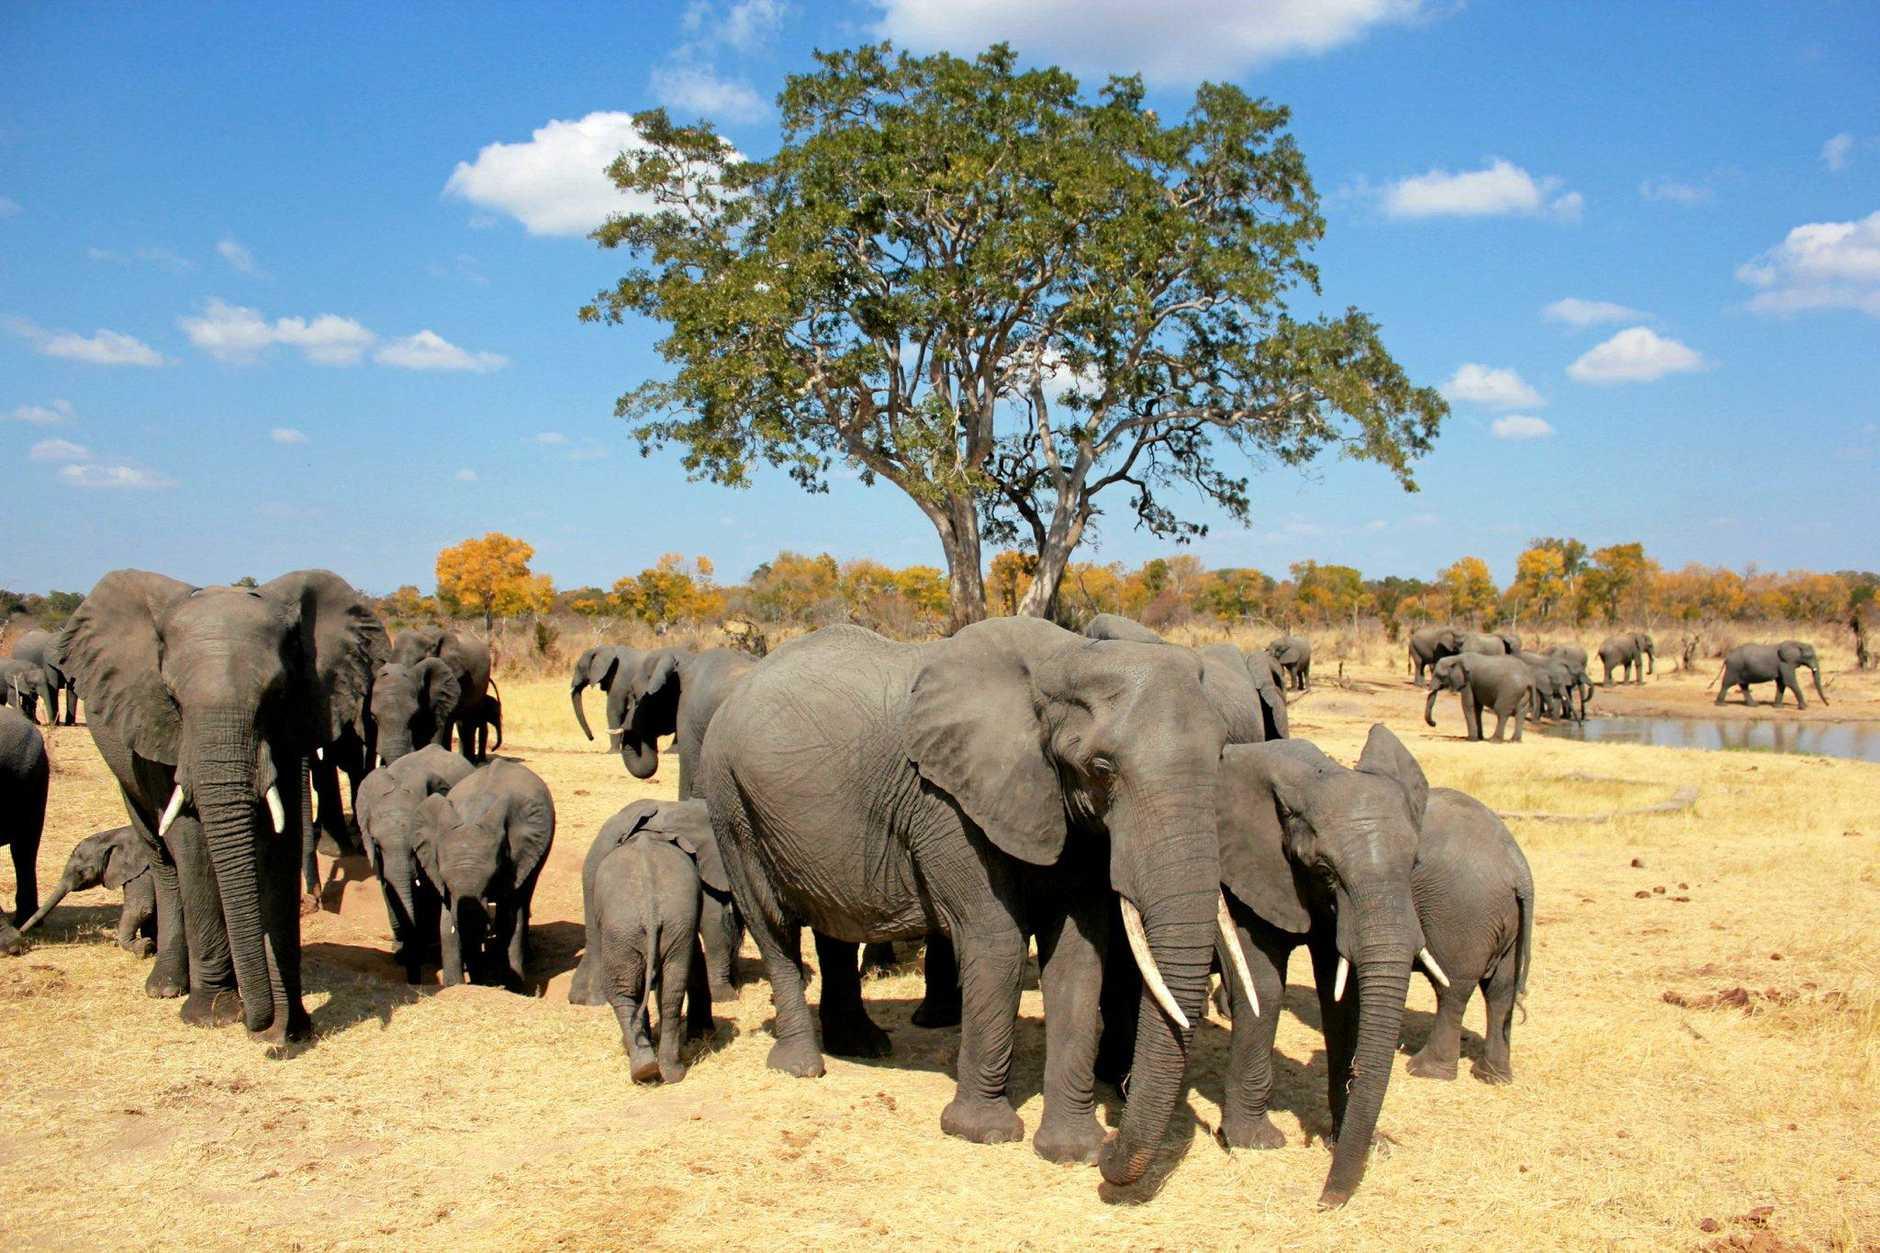 Sharon Pincott and her beloved elephants.